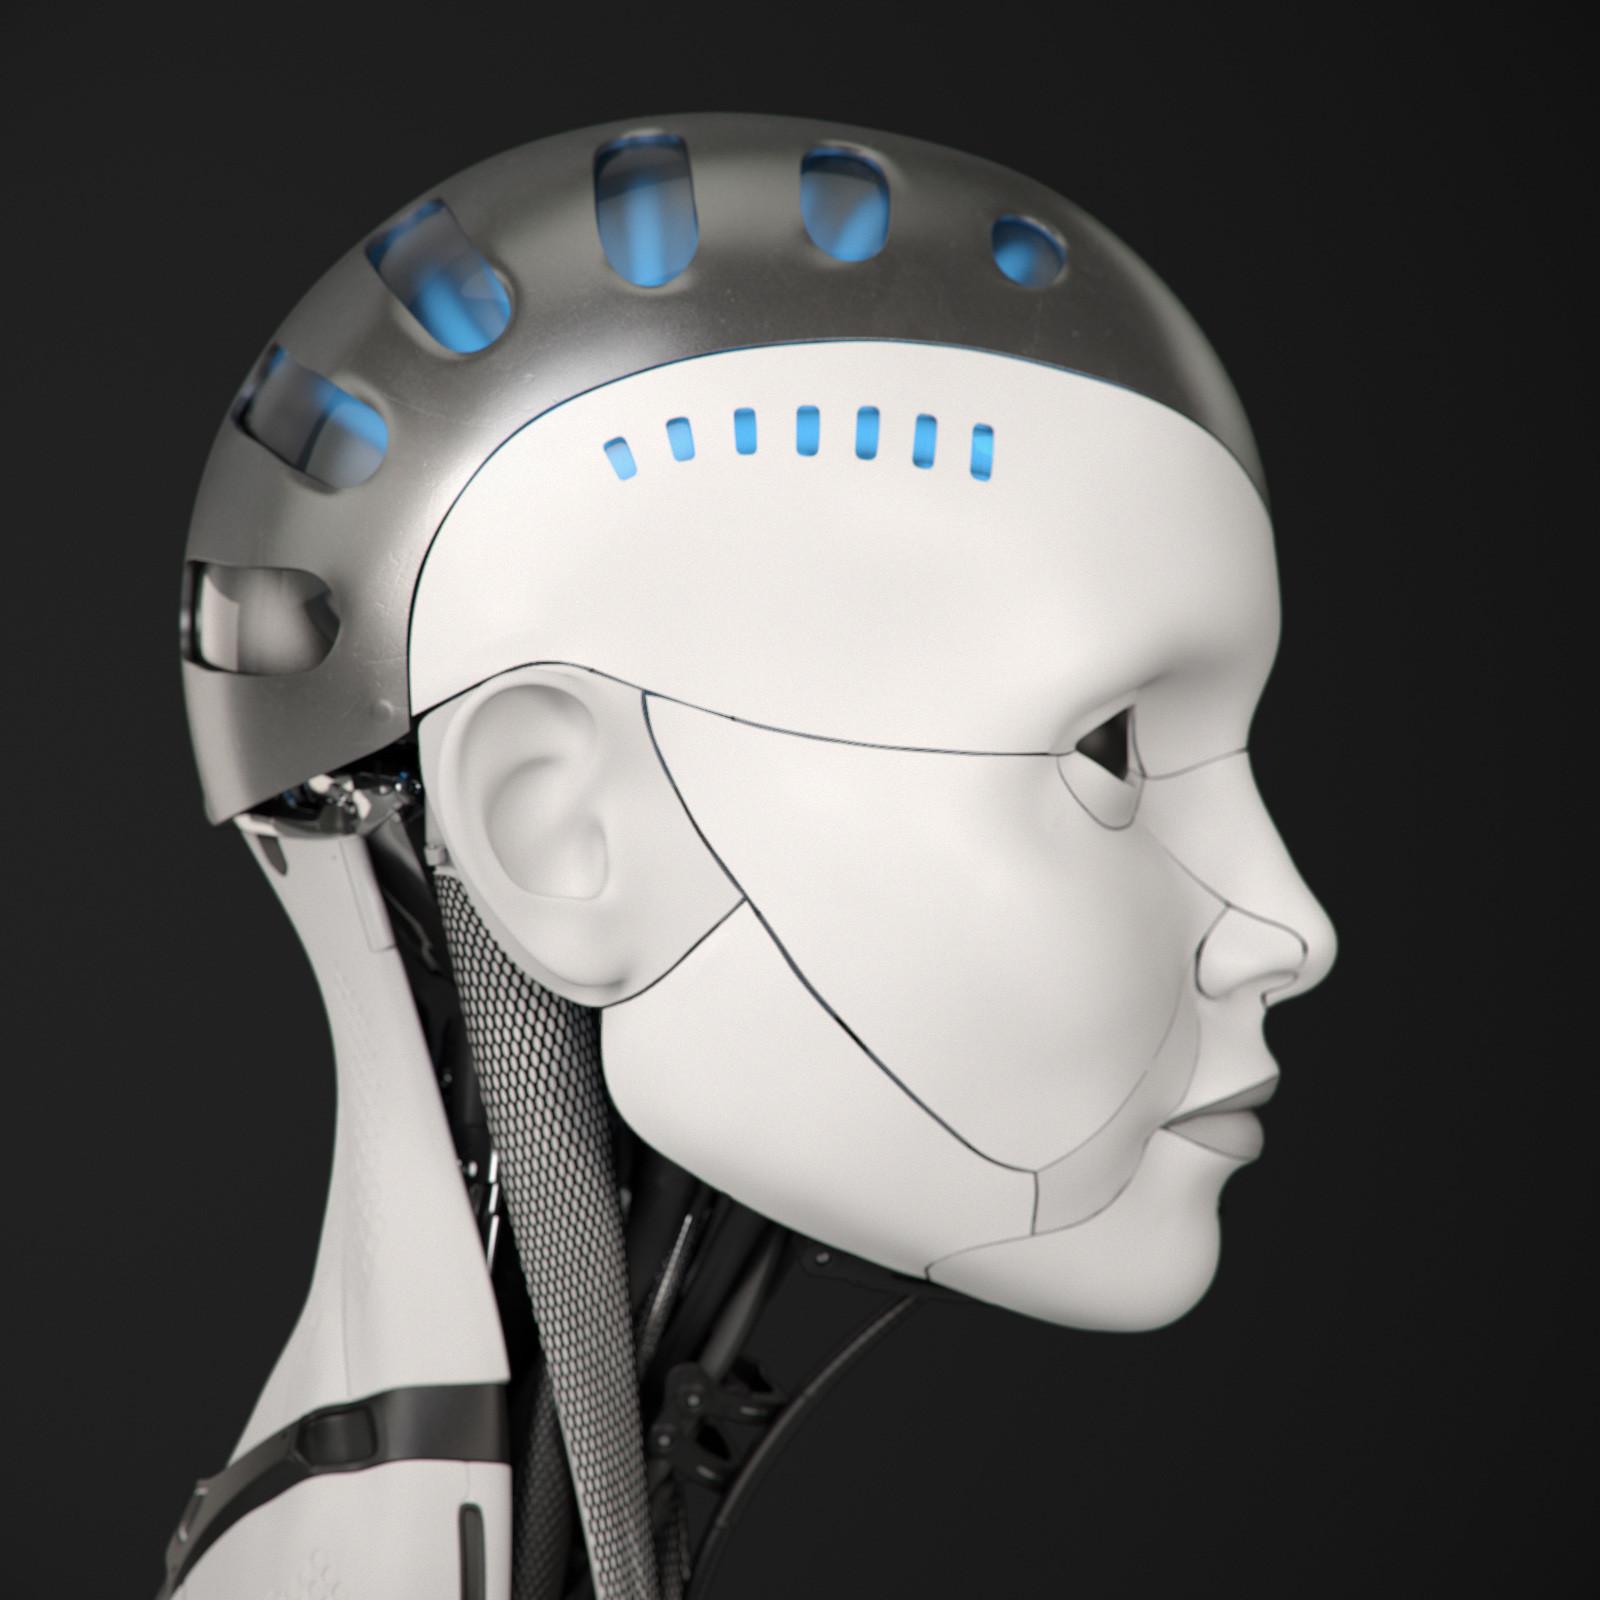 Cgmonkeyking dvc face cyborg00 pn01 pp01 side